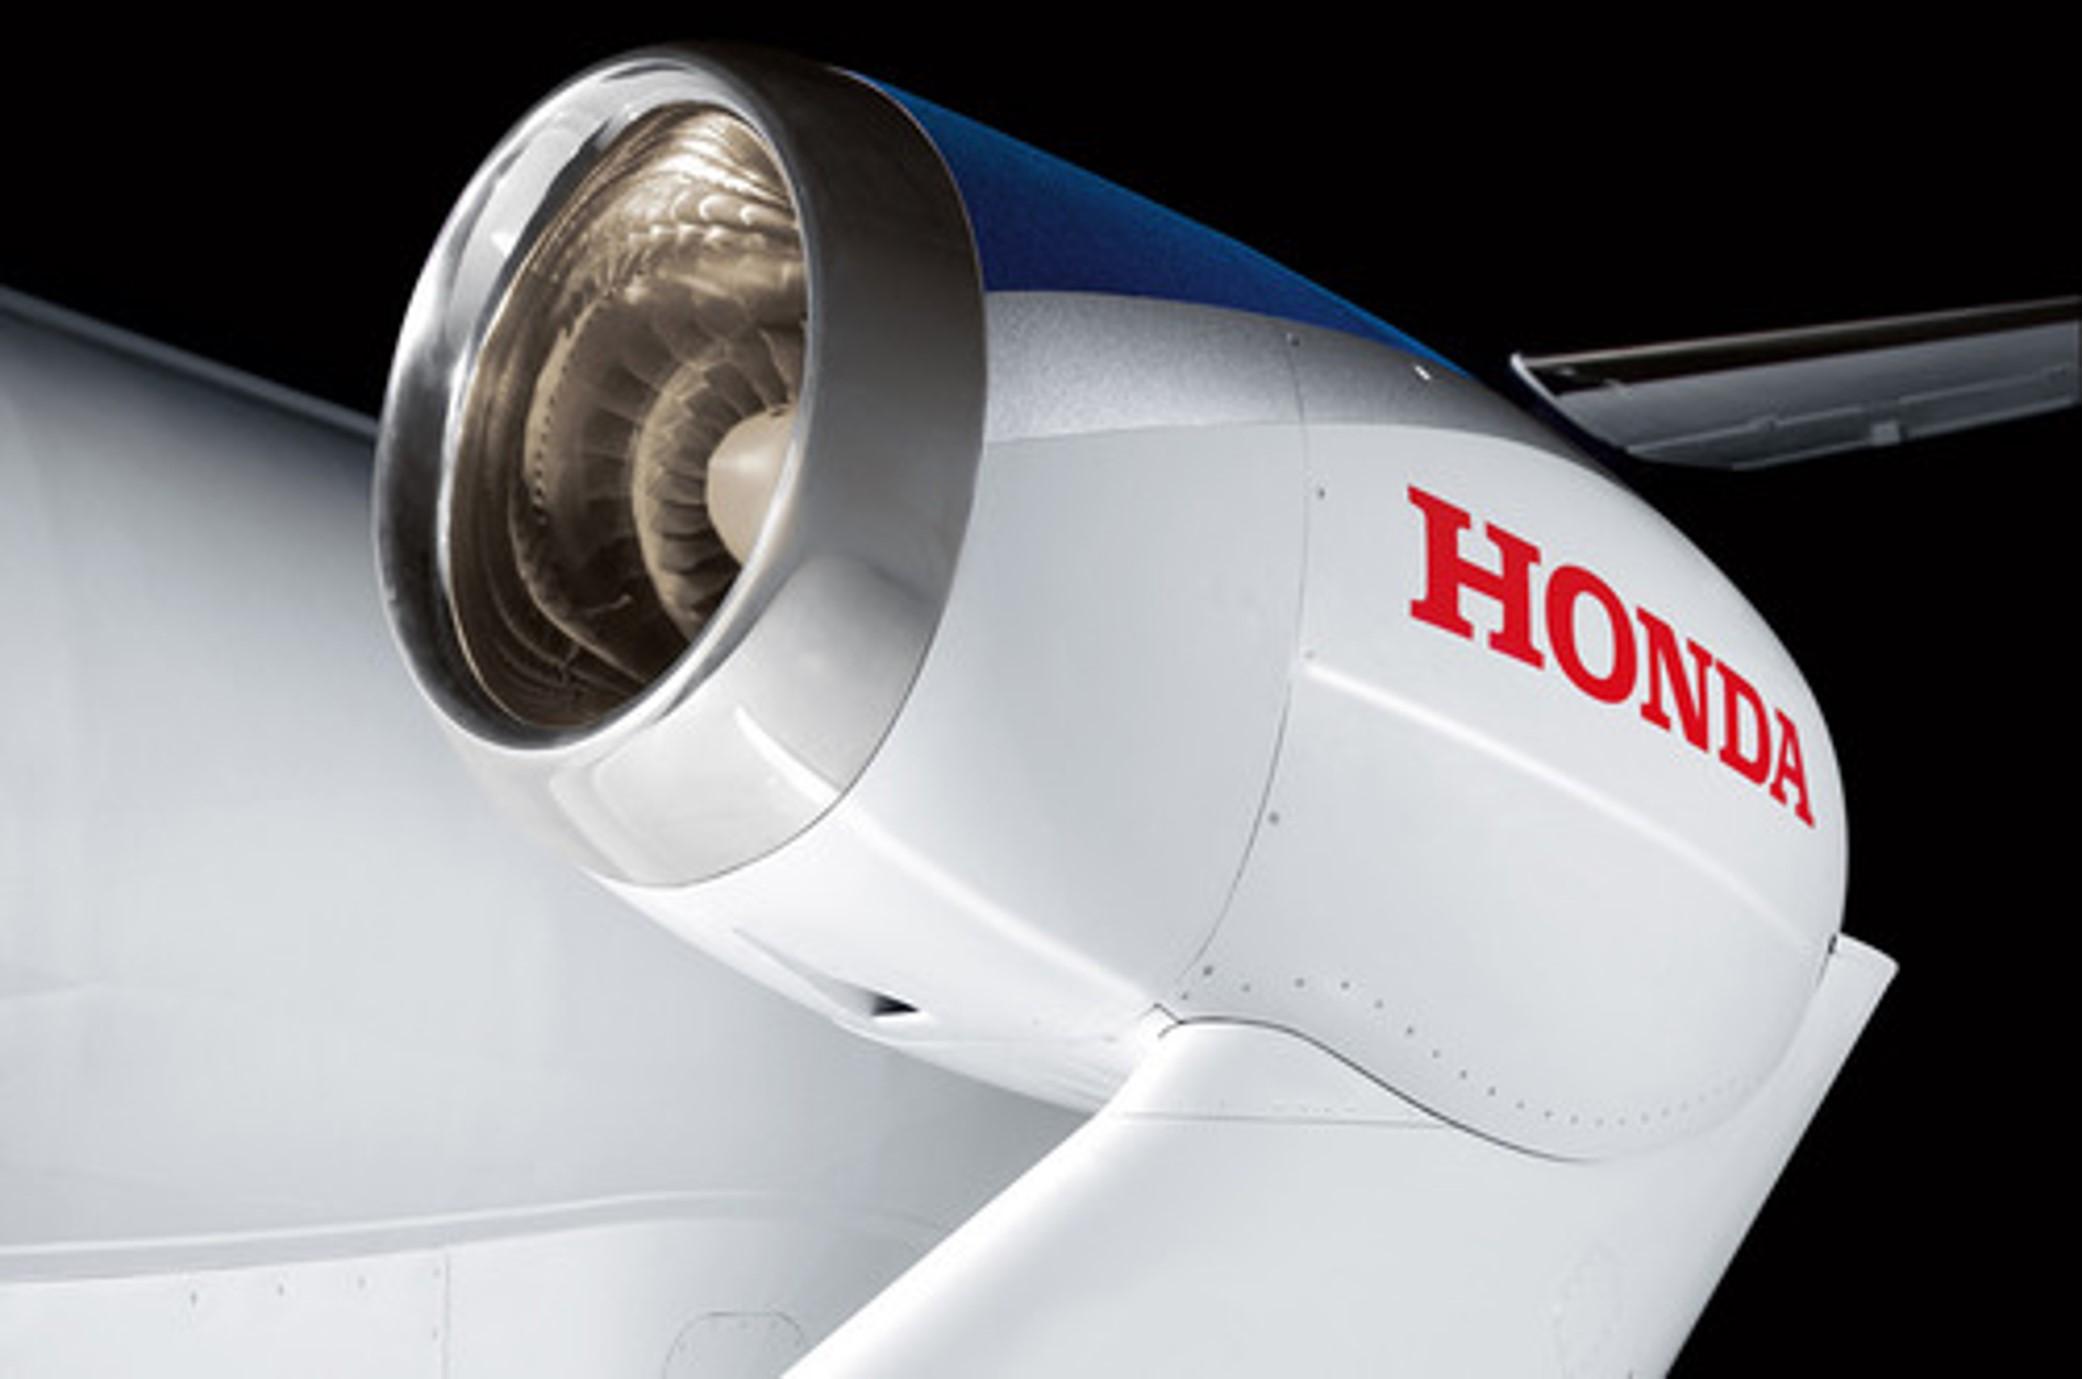 HondaJet gets its engine